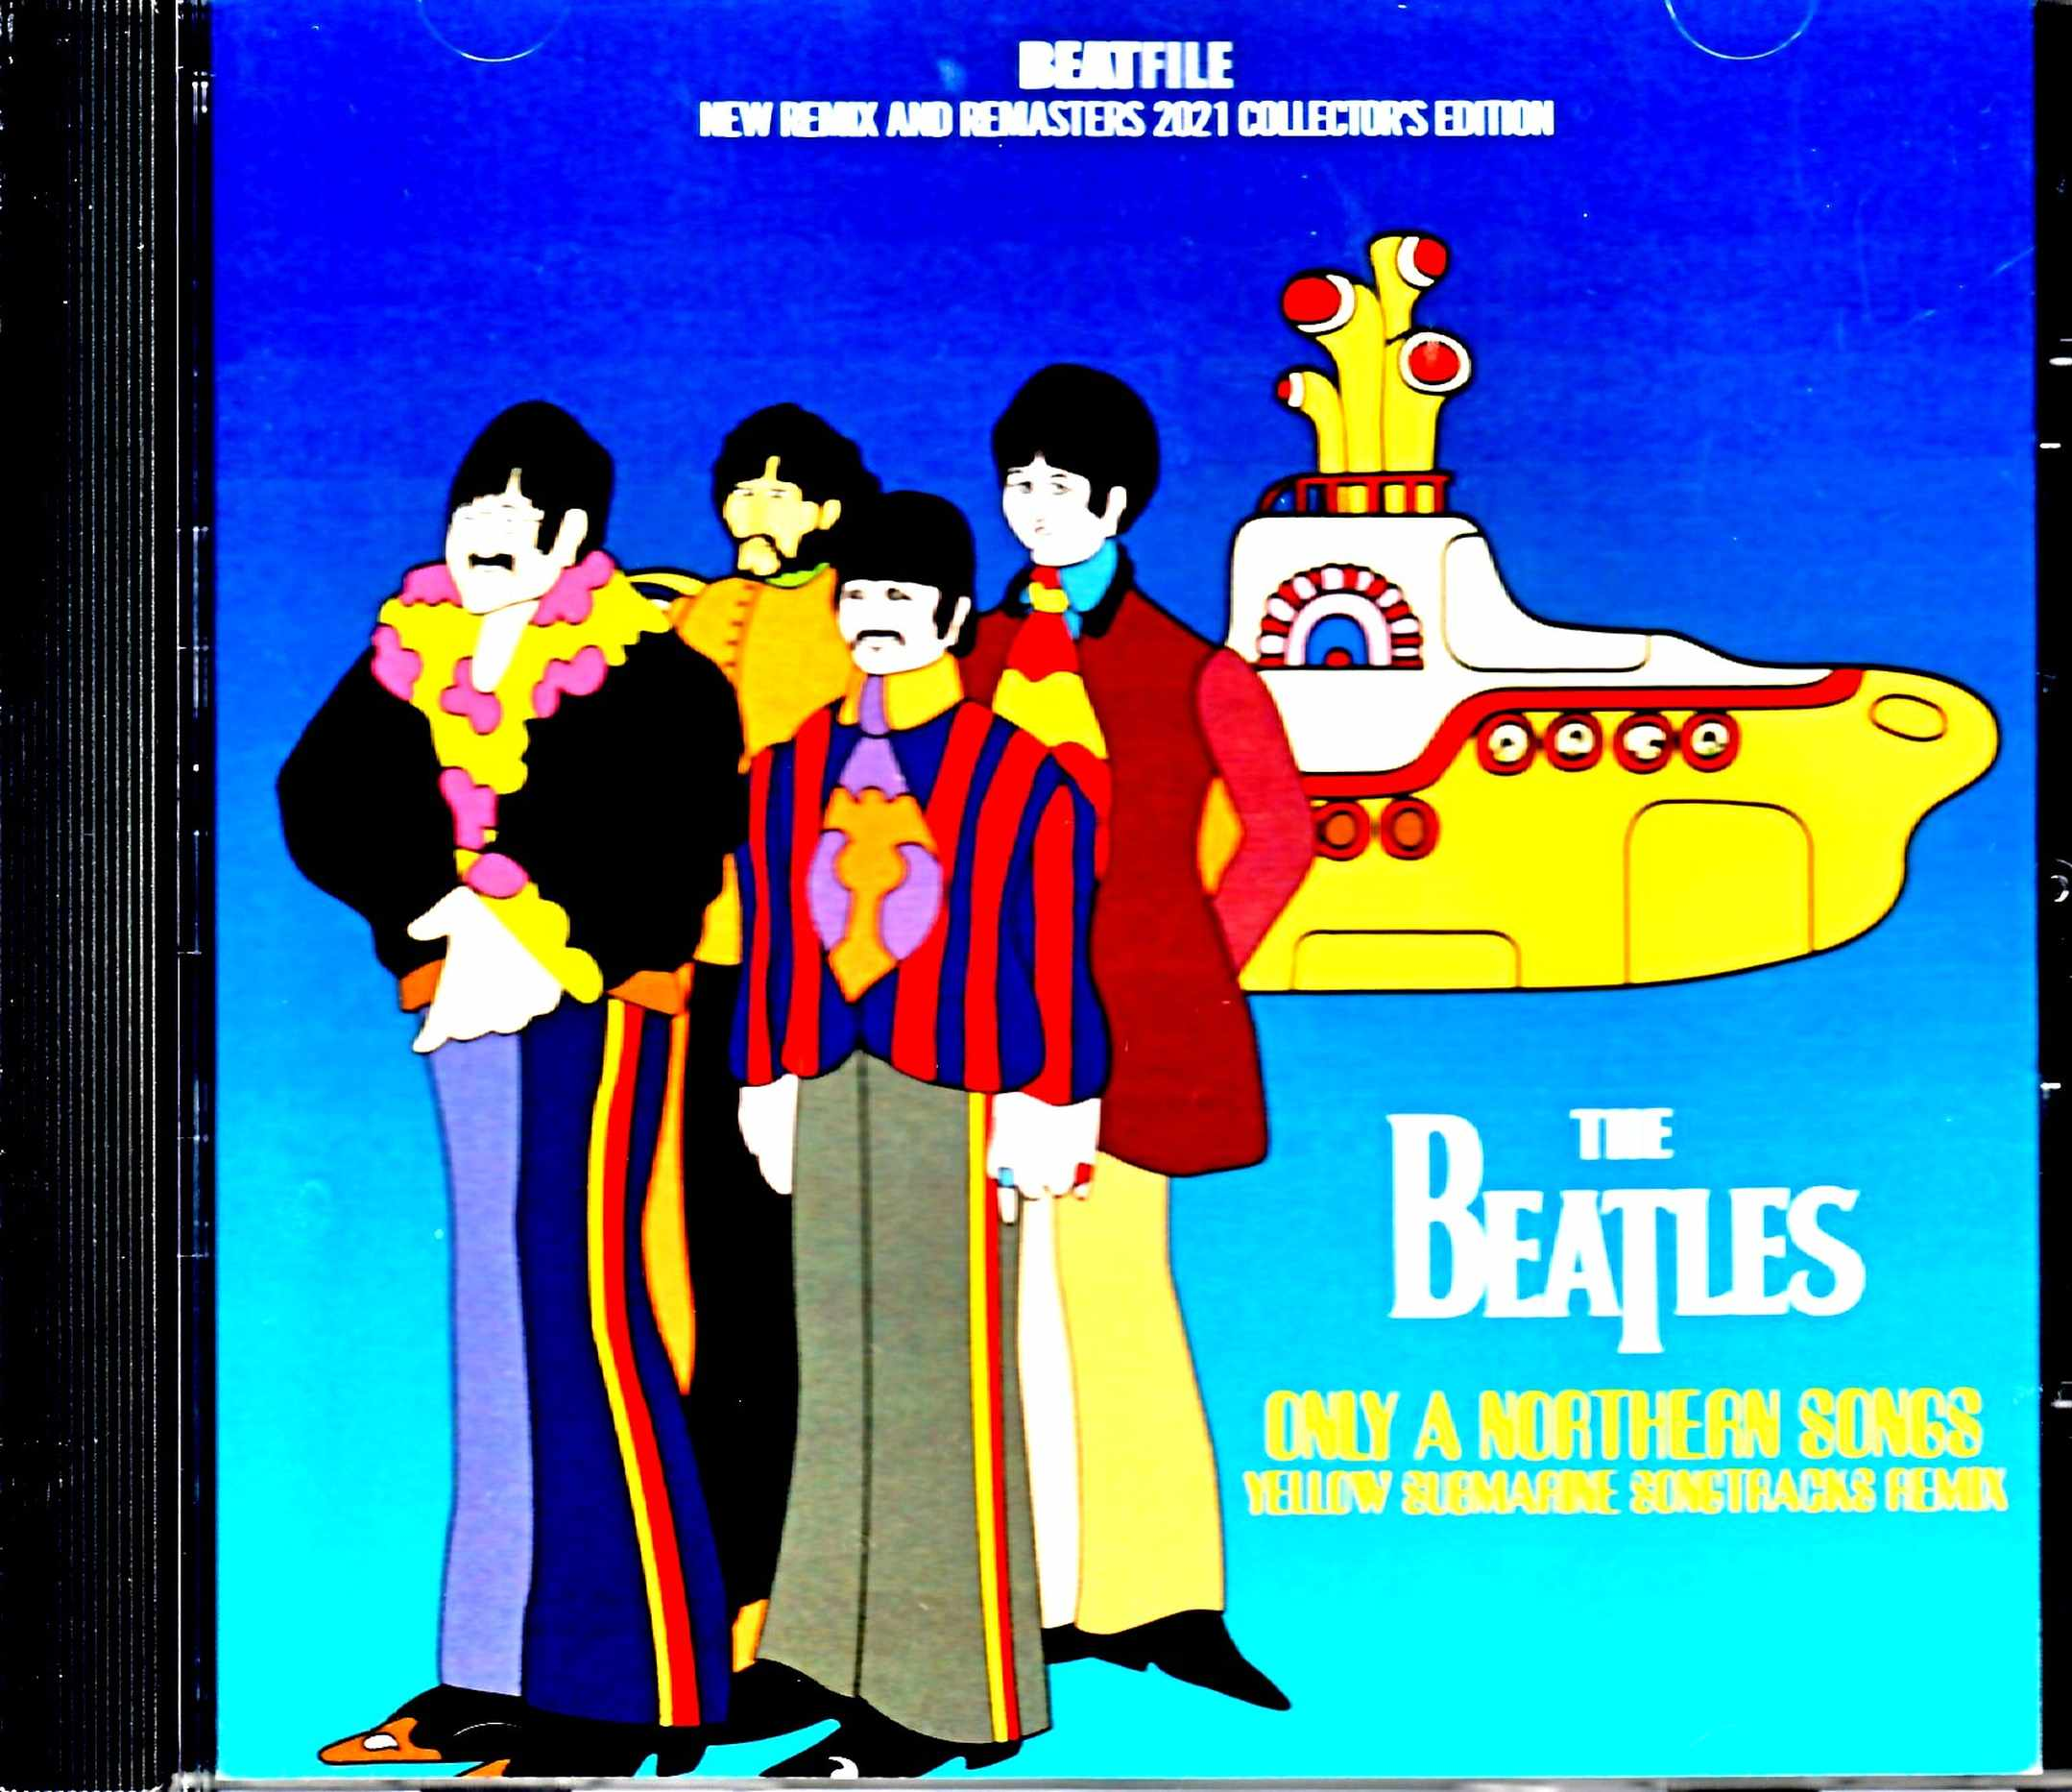 Beatles ビートルズ/イエロー・サブマリン Yellow Submarine Song Tracks Remix